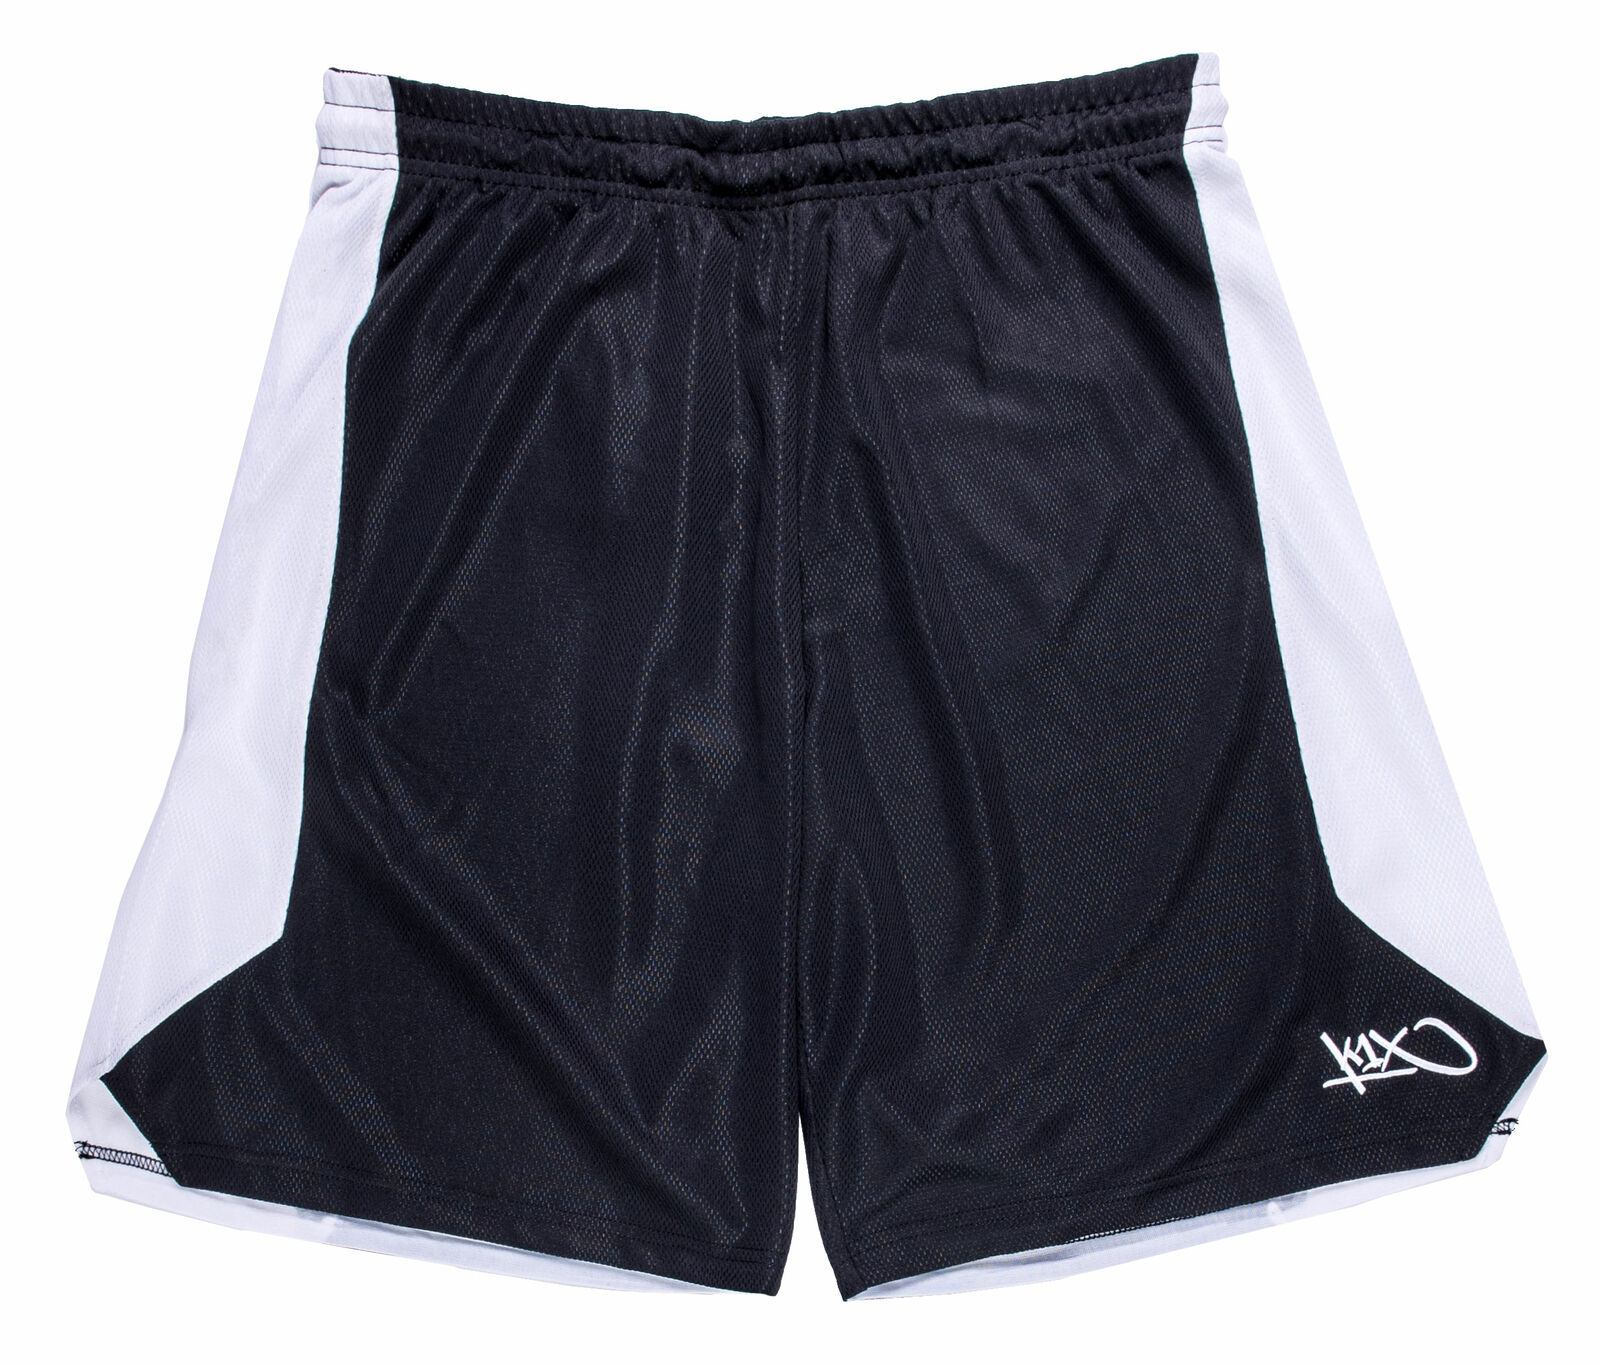 K1X Triple Double Basketball Shorts - Black White Red